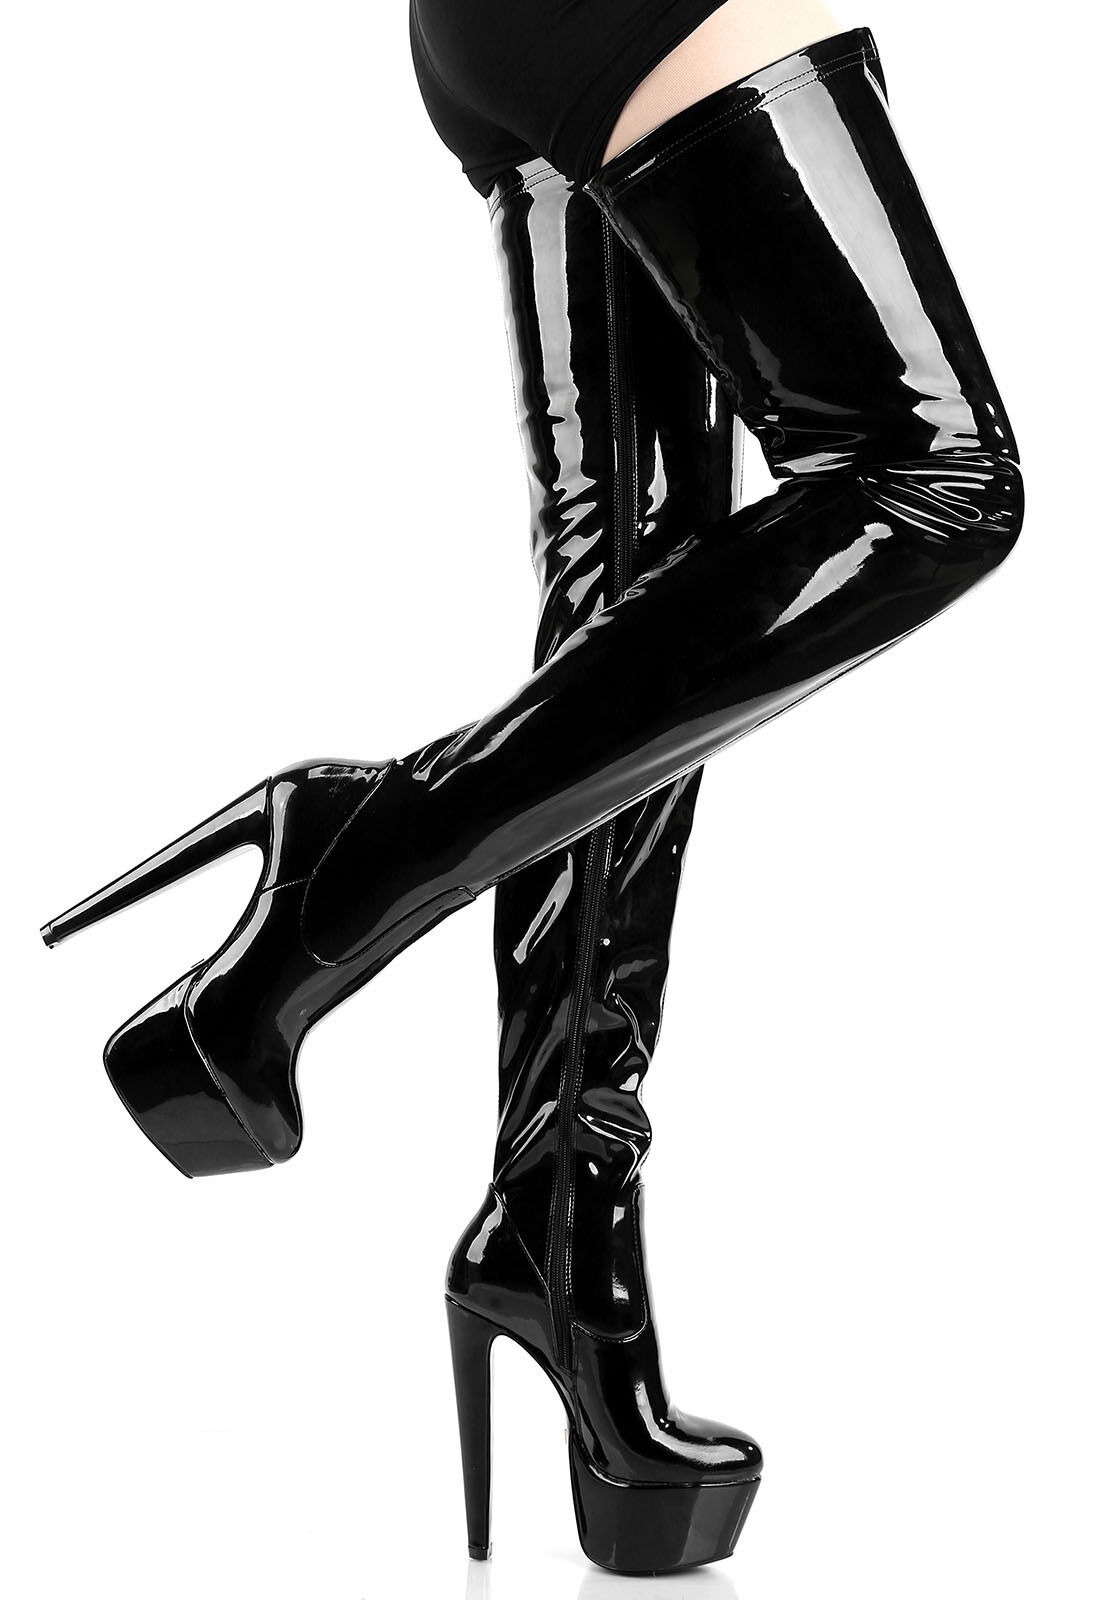 80% di sconto DESTROYER nero Shiny Overknee Overknee Overknee Thigh stivali with chunky heel  qualità ufficiale